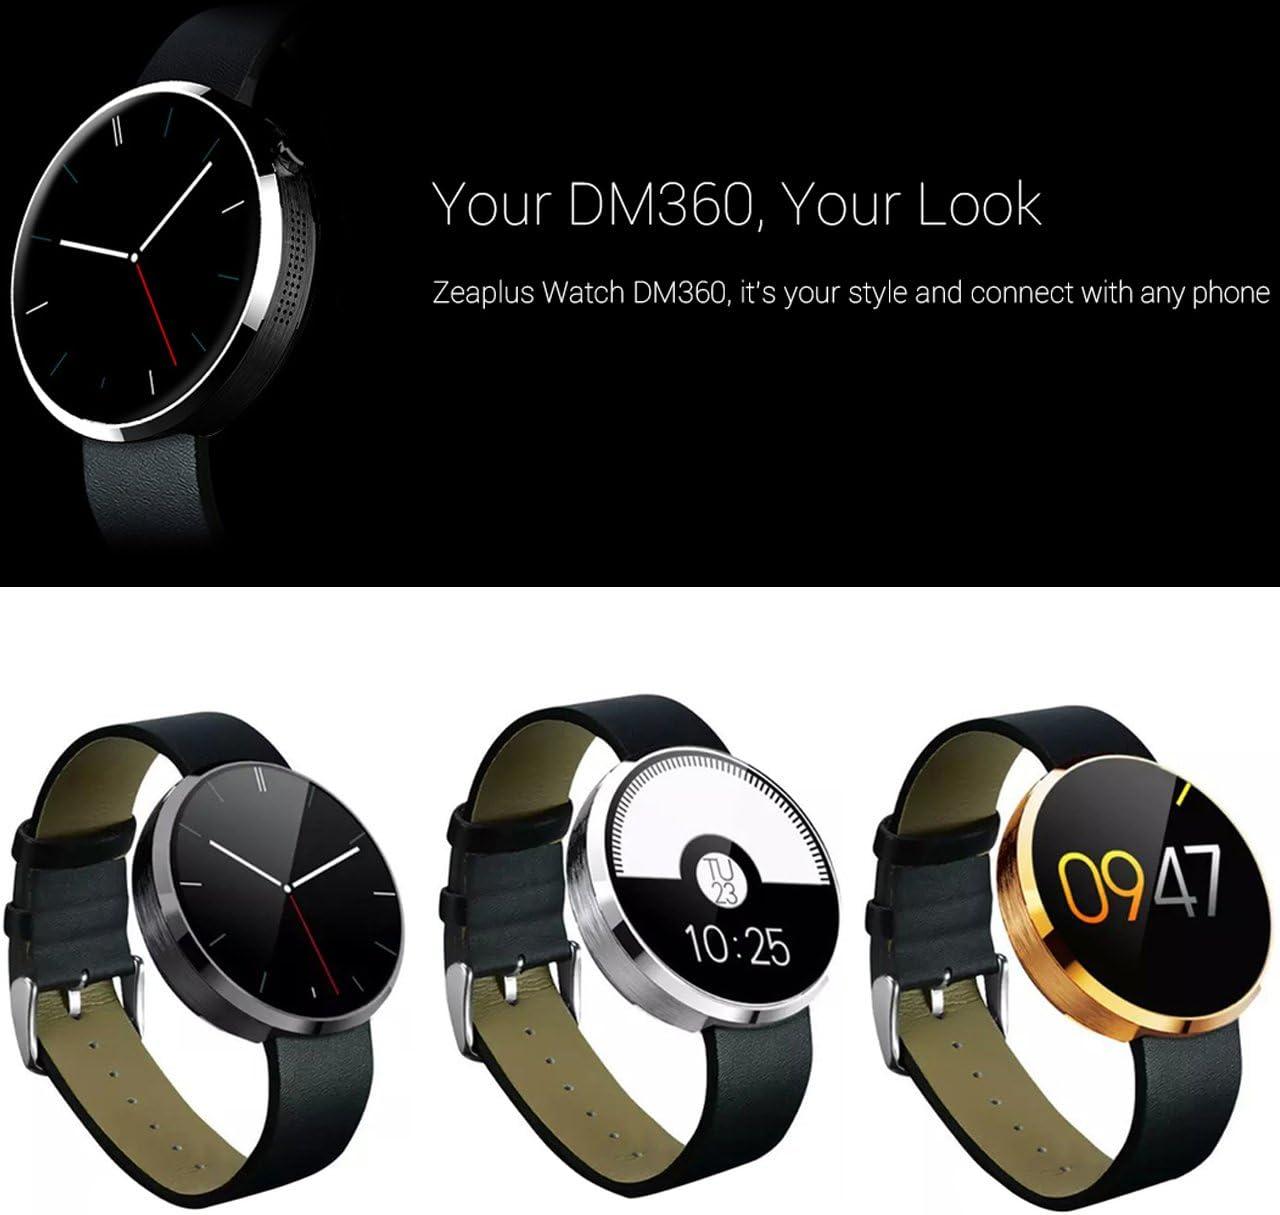 DM360 Zeaplus deportes reloj inteligente para iPhone iOS iPhone y ...